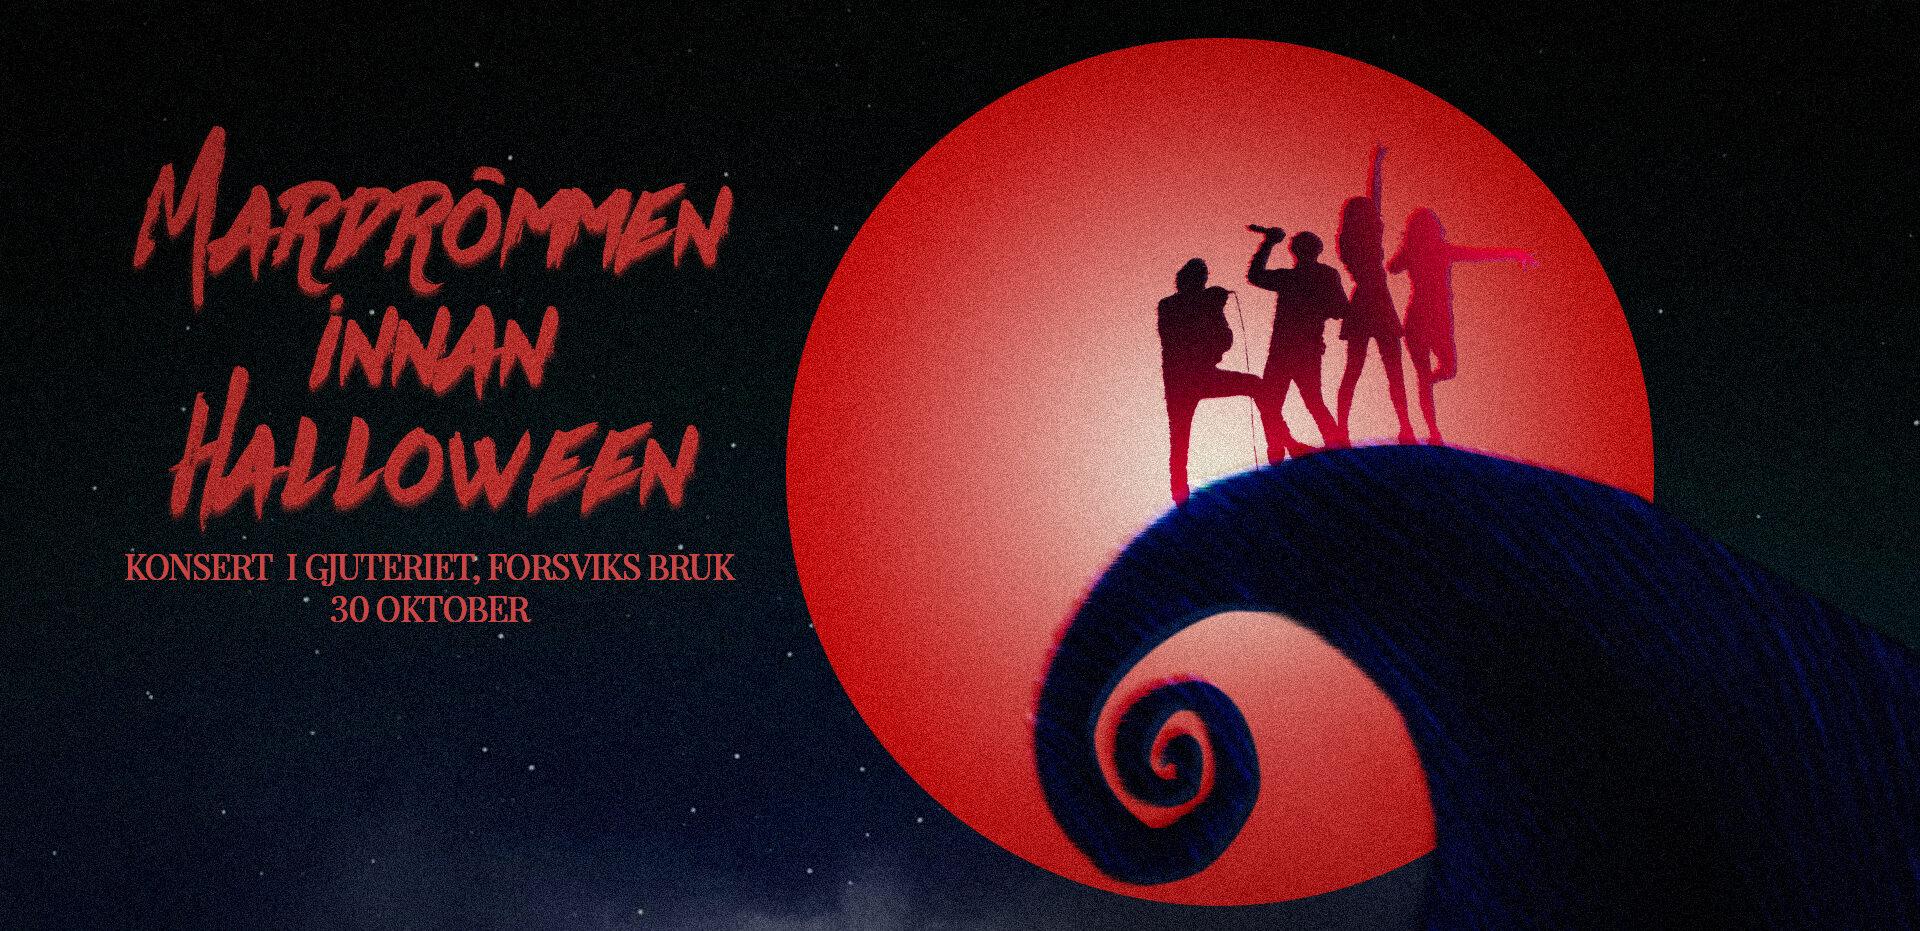 Mardrömmen innan Halloween